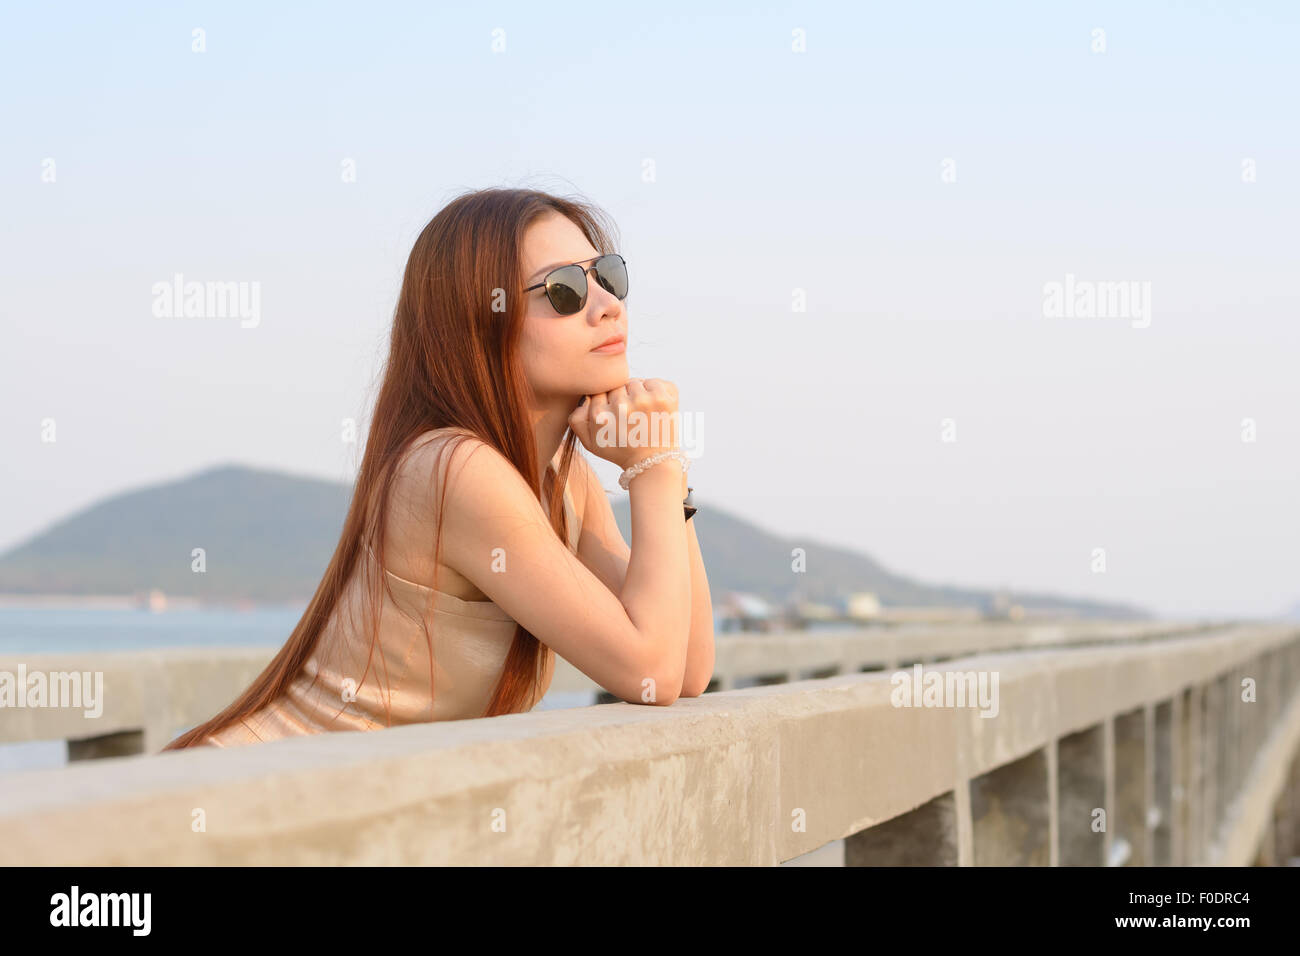 Asian women wear sunglass standing on the bridge - Stock Image